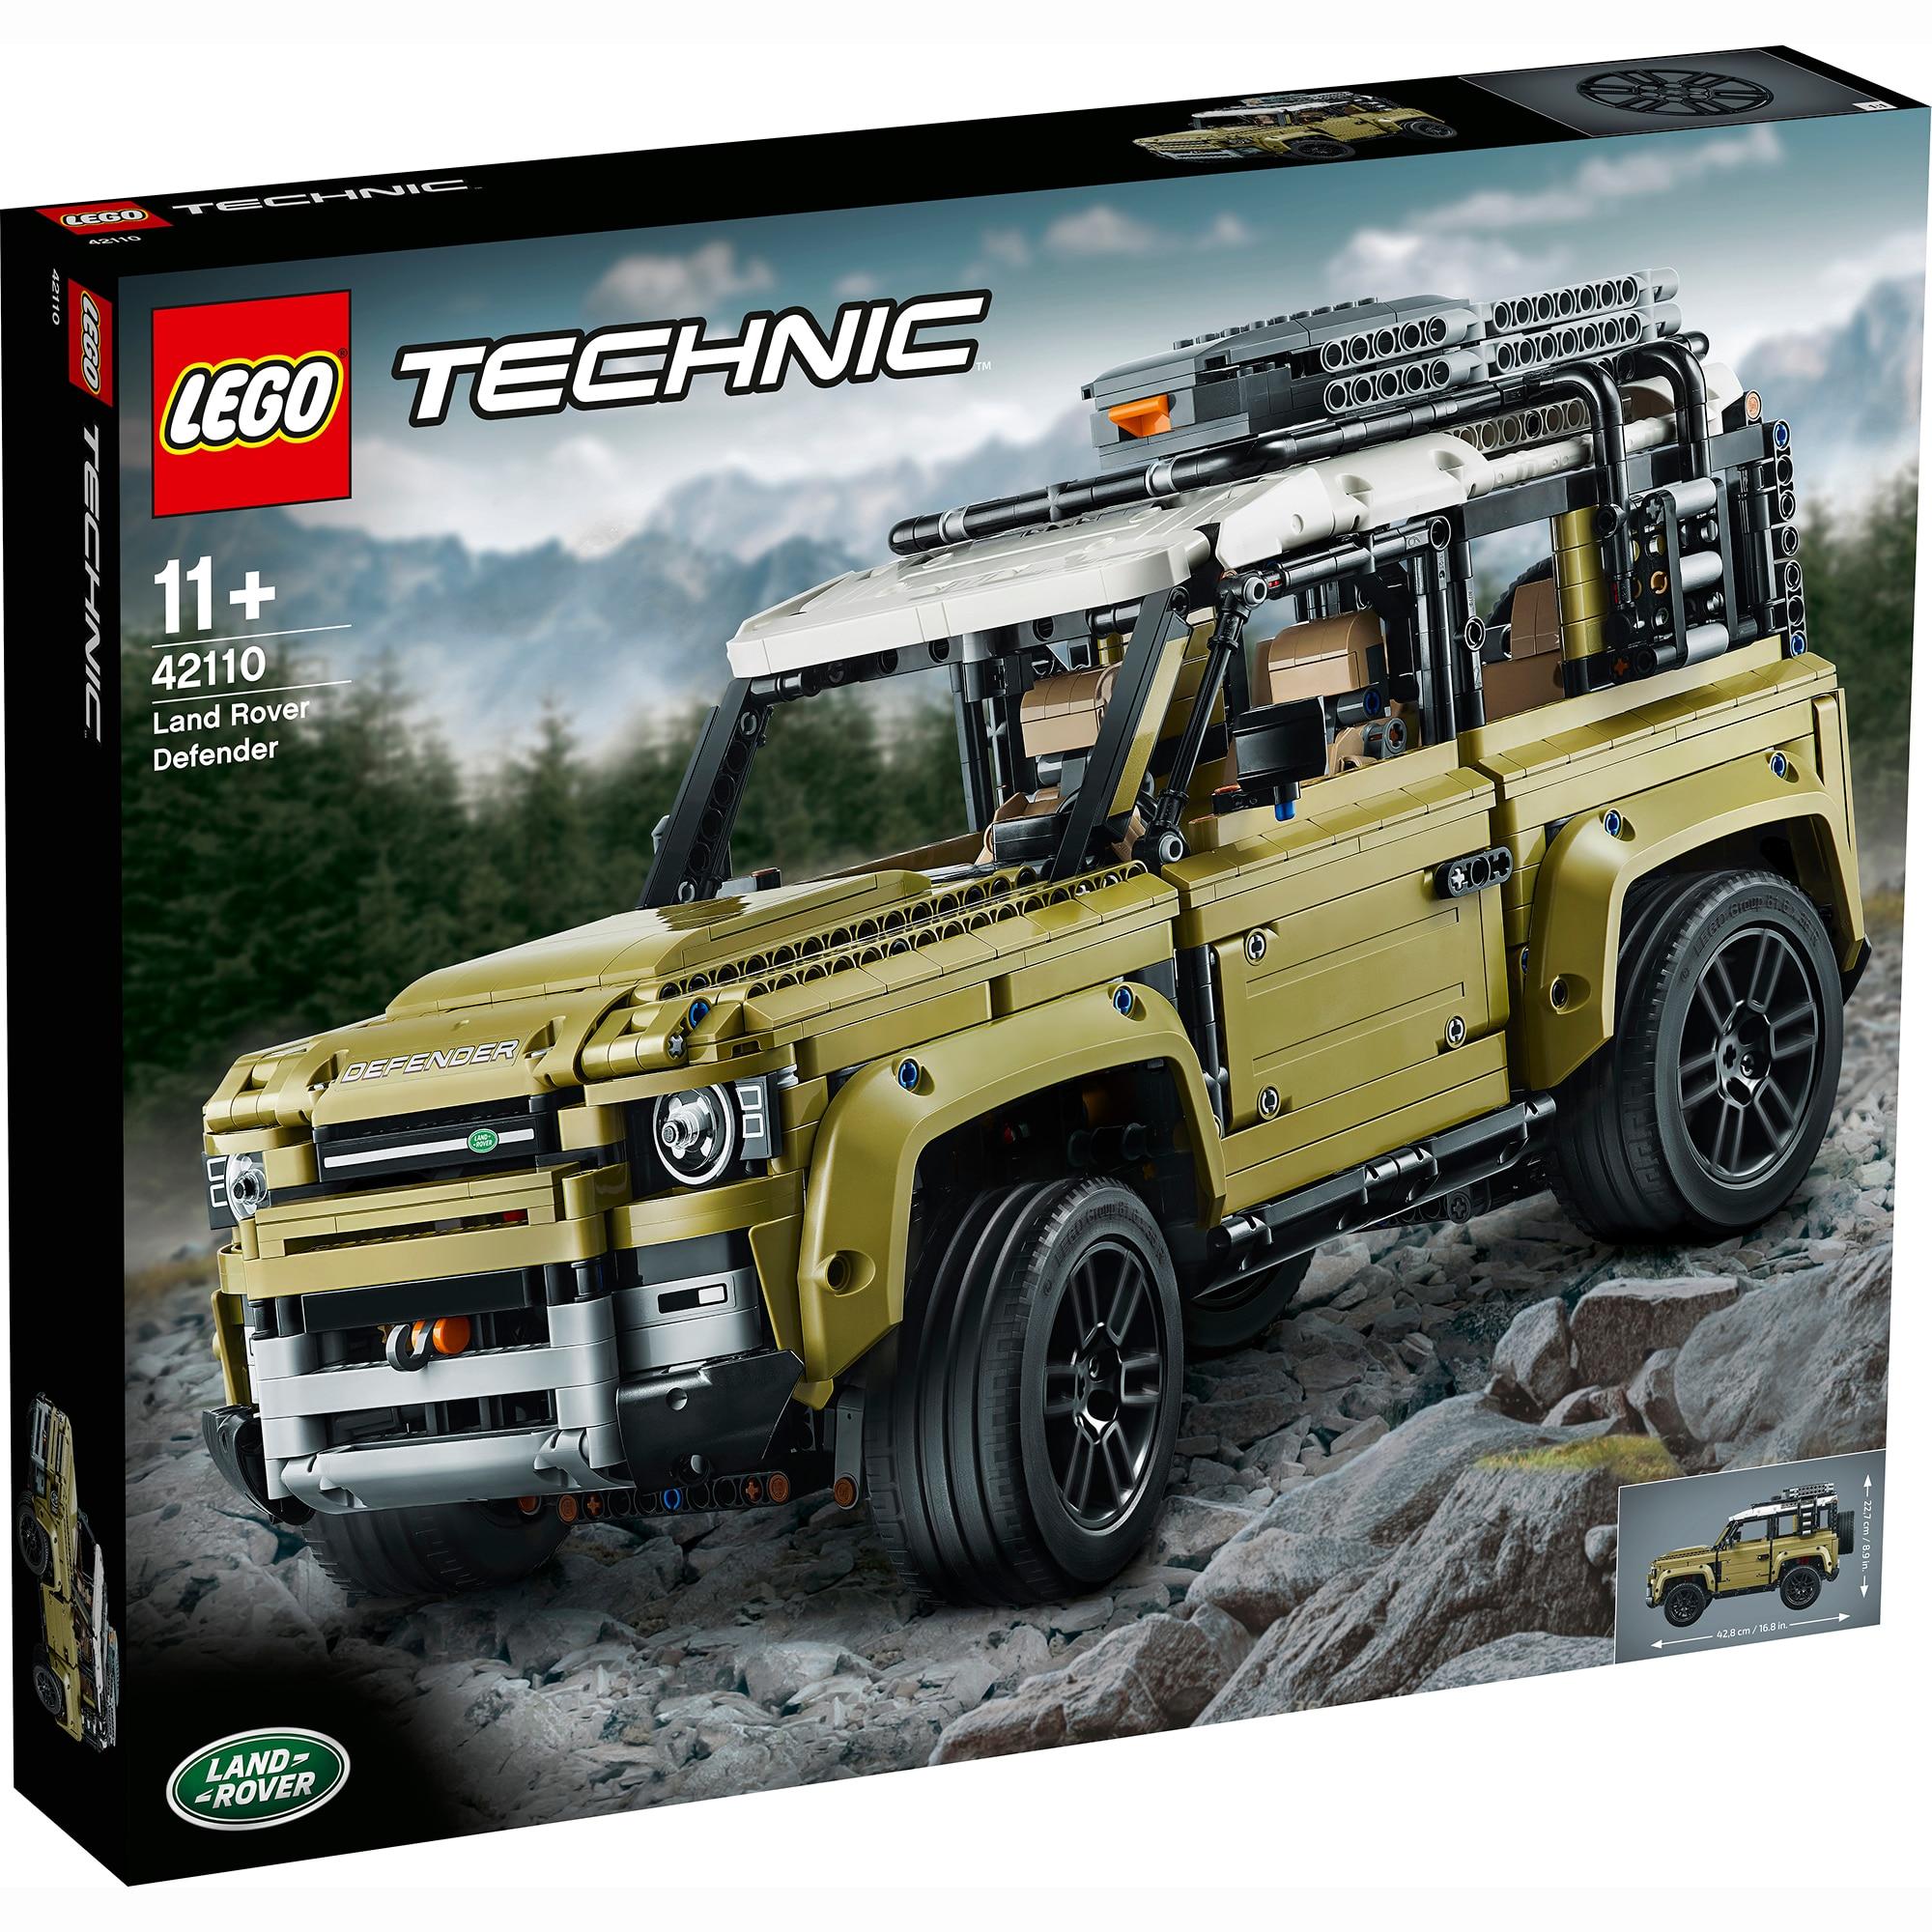 Fotografie LEGO Technic - Land Rover Defender 42110, 2573 piese